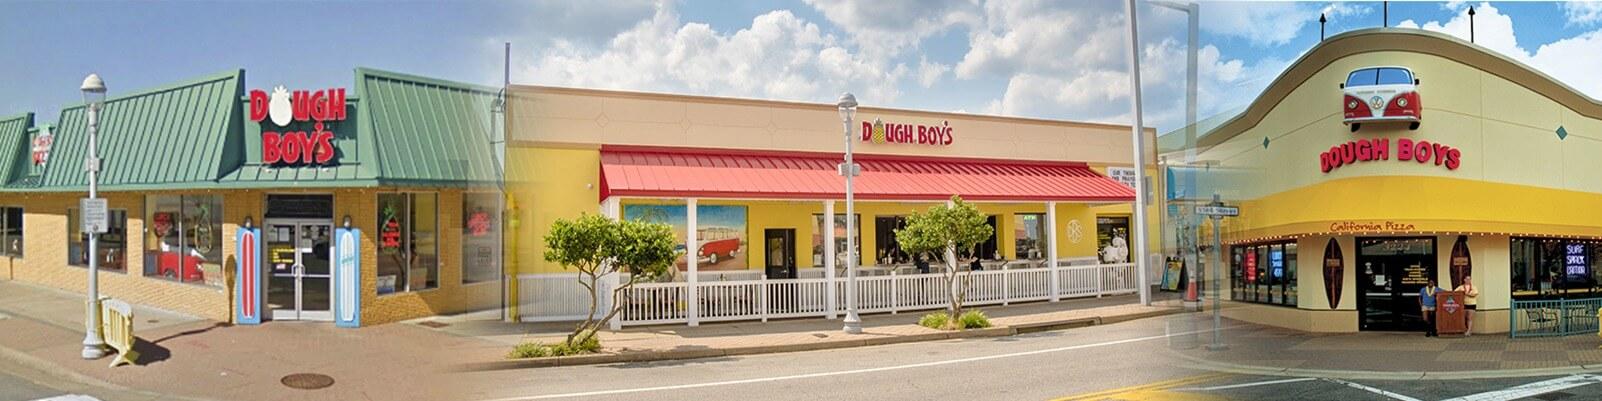 virginia beach pizza restaurant